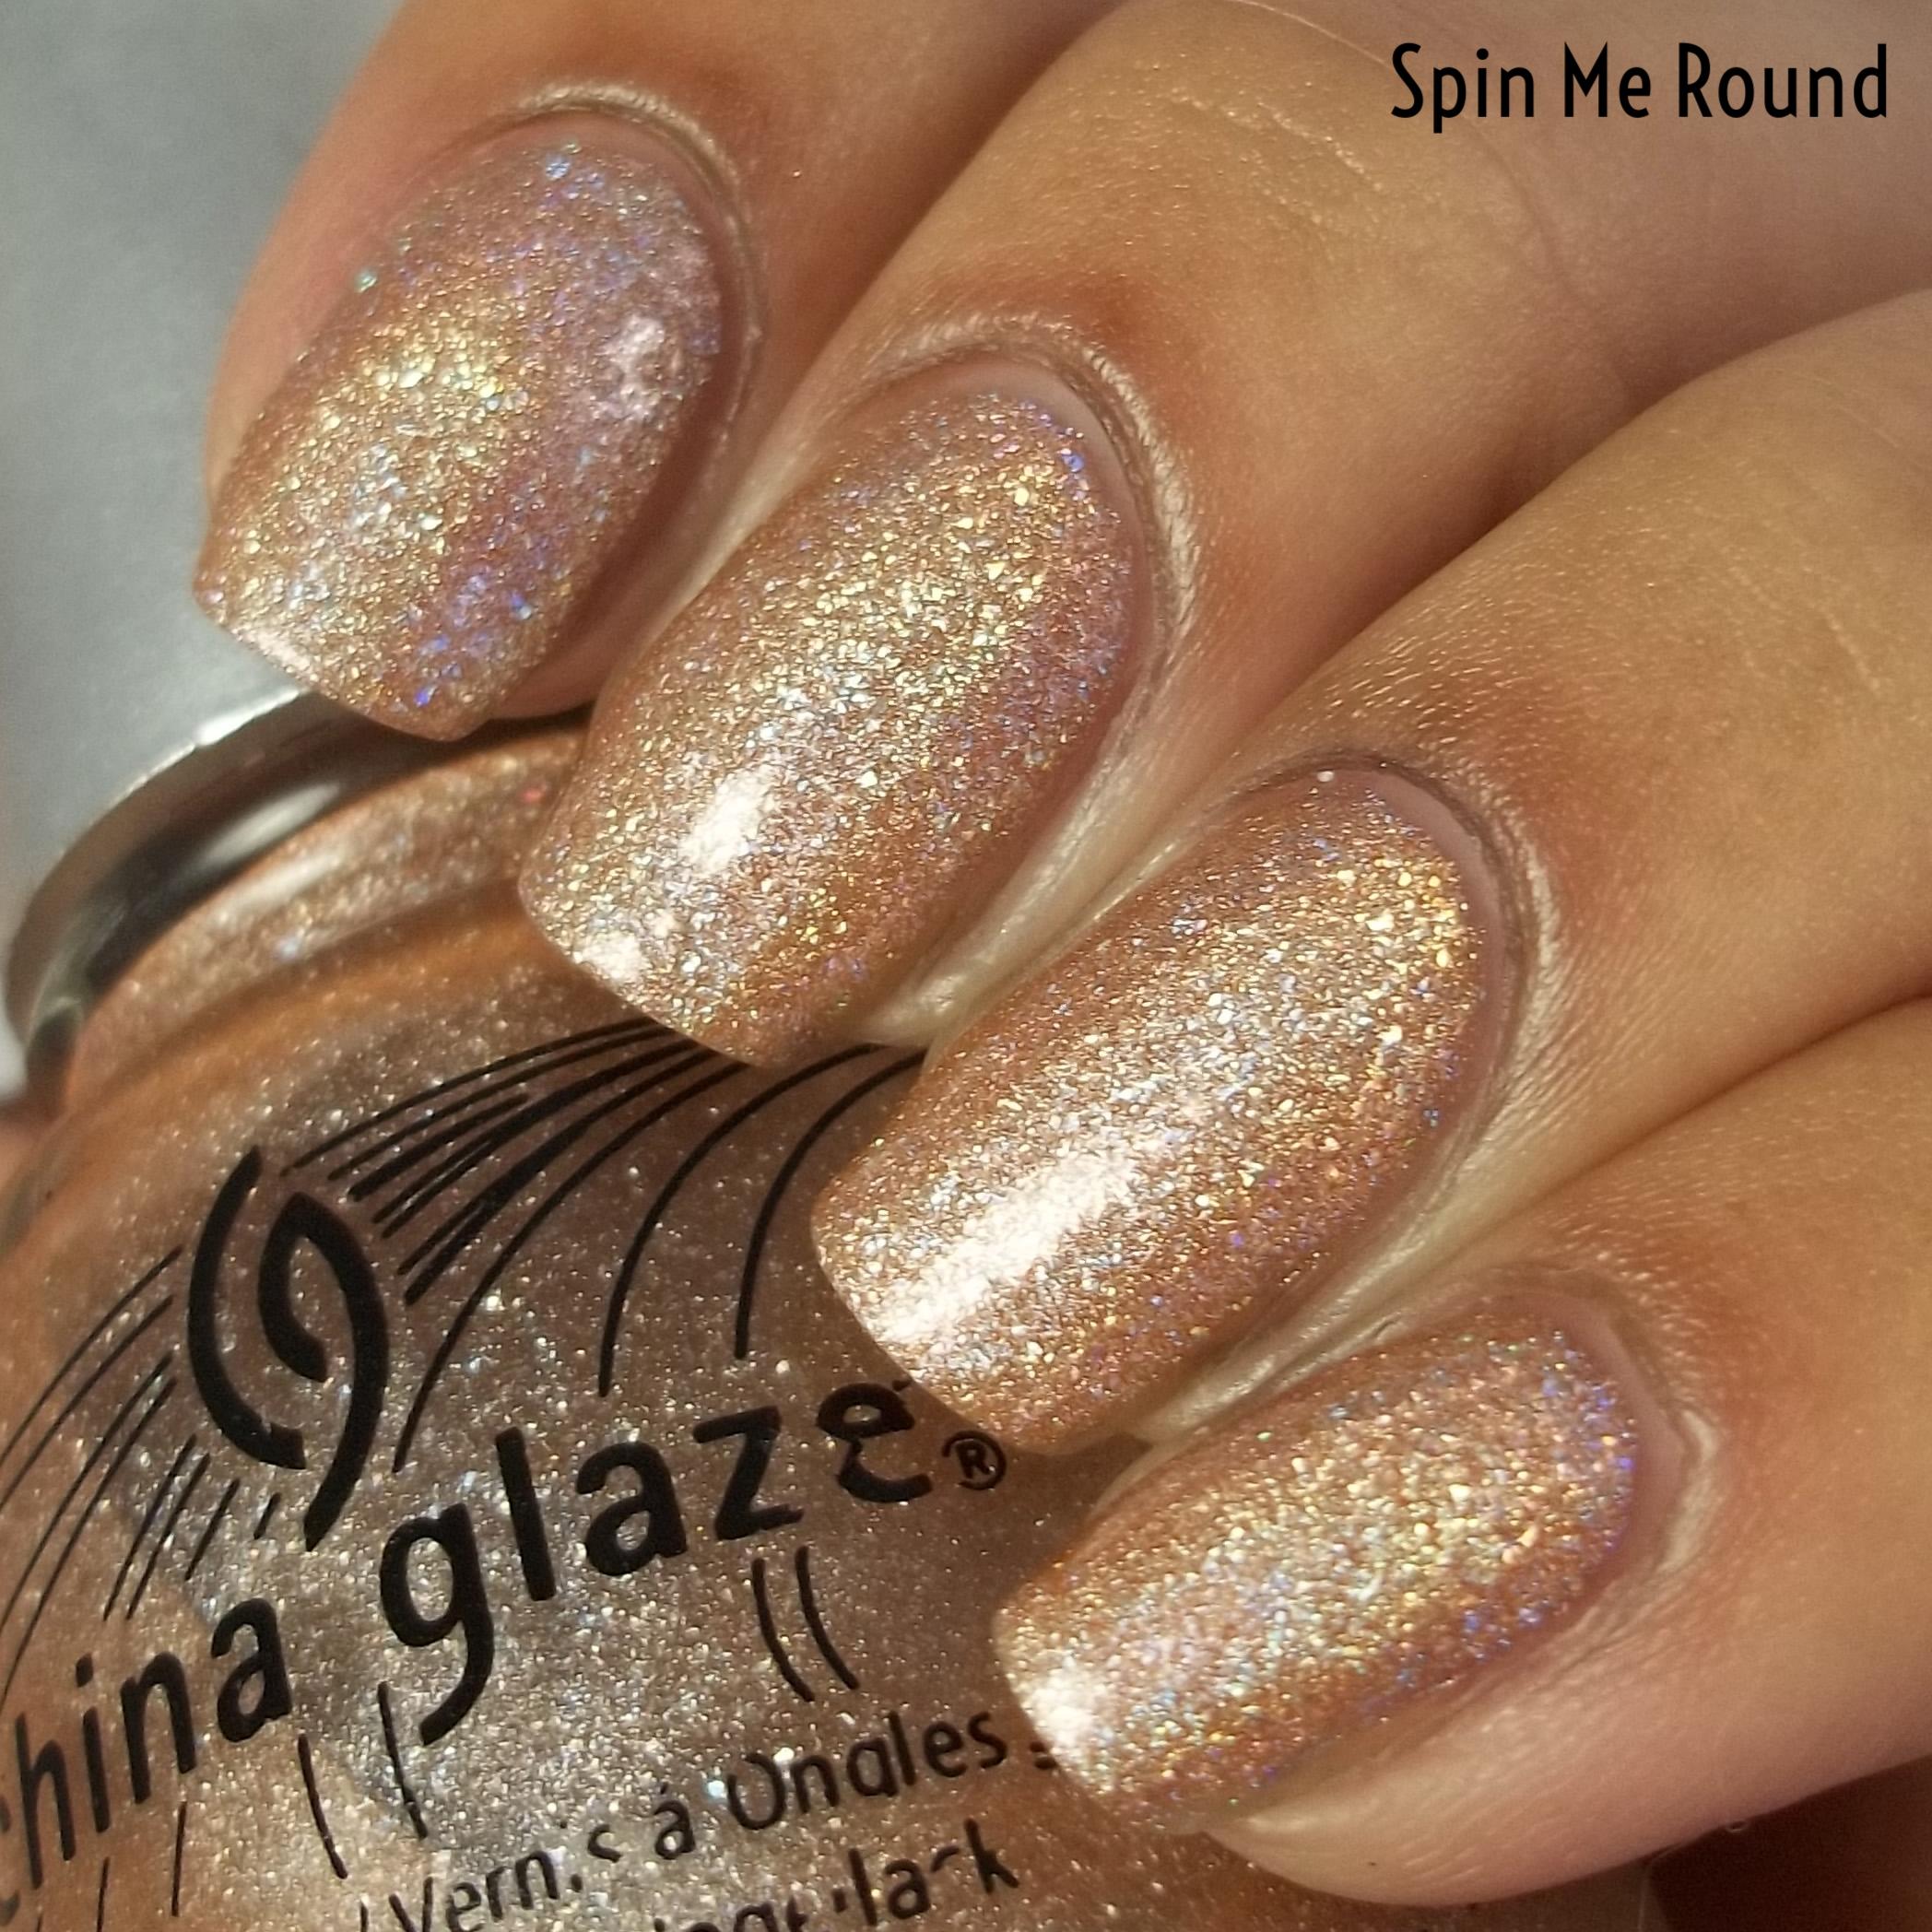 China Glaze Kaleidoscope - Spin Me Round.jpg